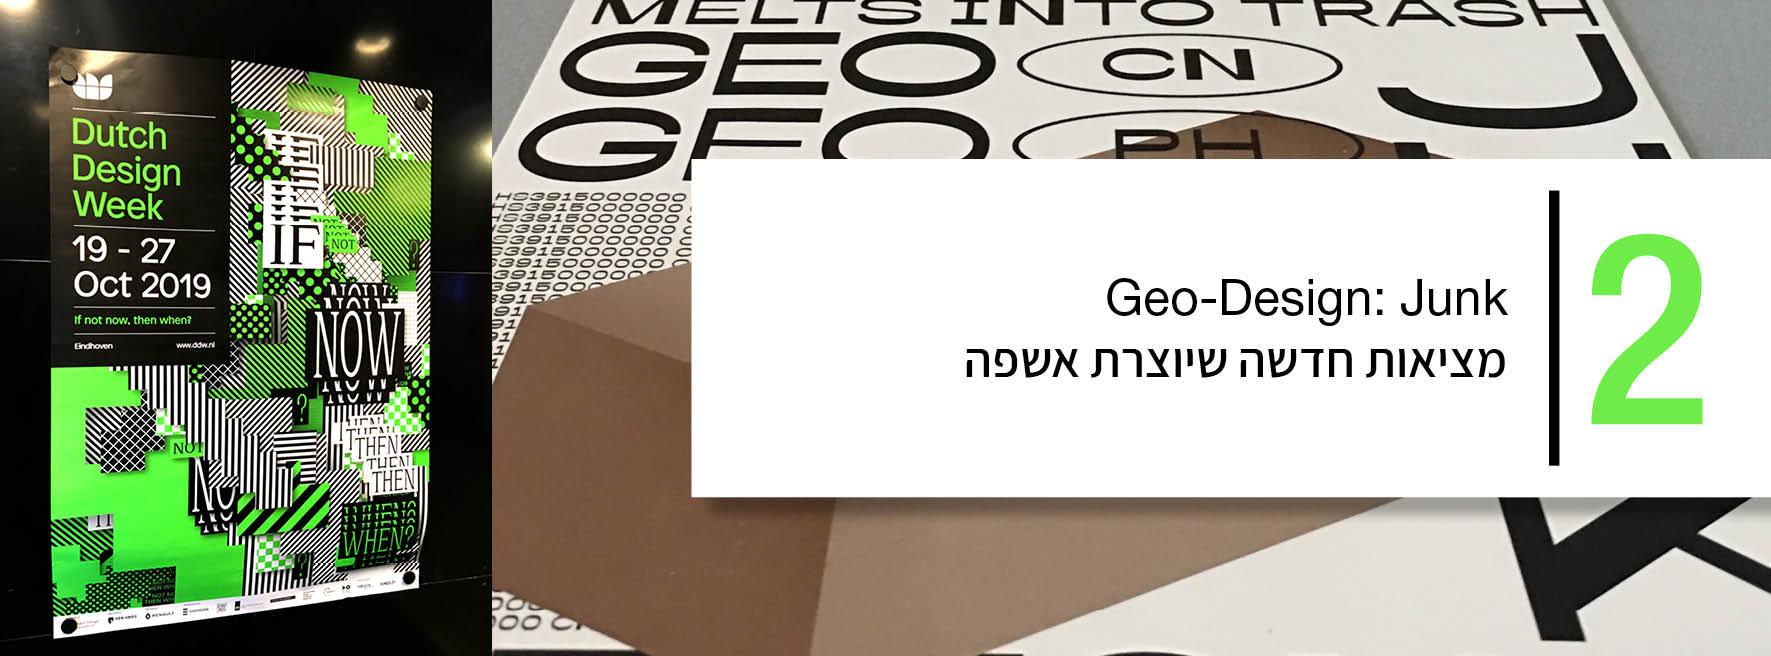 Geo-Design:Junk מציאות חדשה שיוצרת אשפה